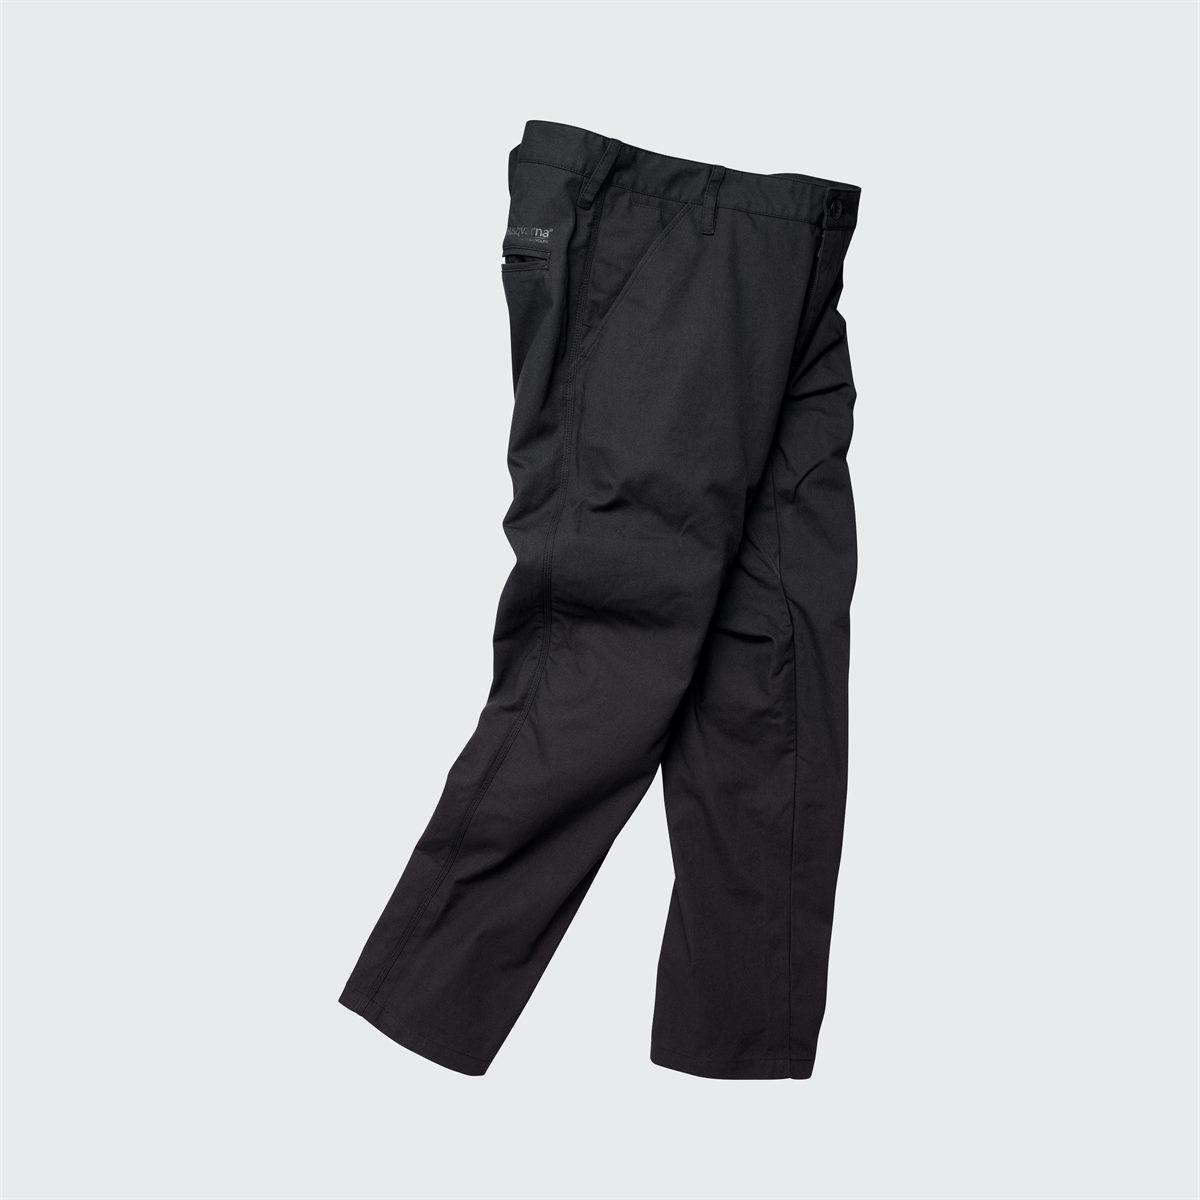 Husqvarna Motorcycles Present 2019 VITPILEN & SVARTPILEN Clothing Collection - PILEN PANTS